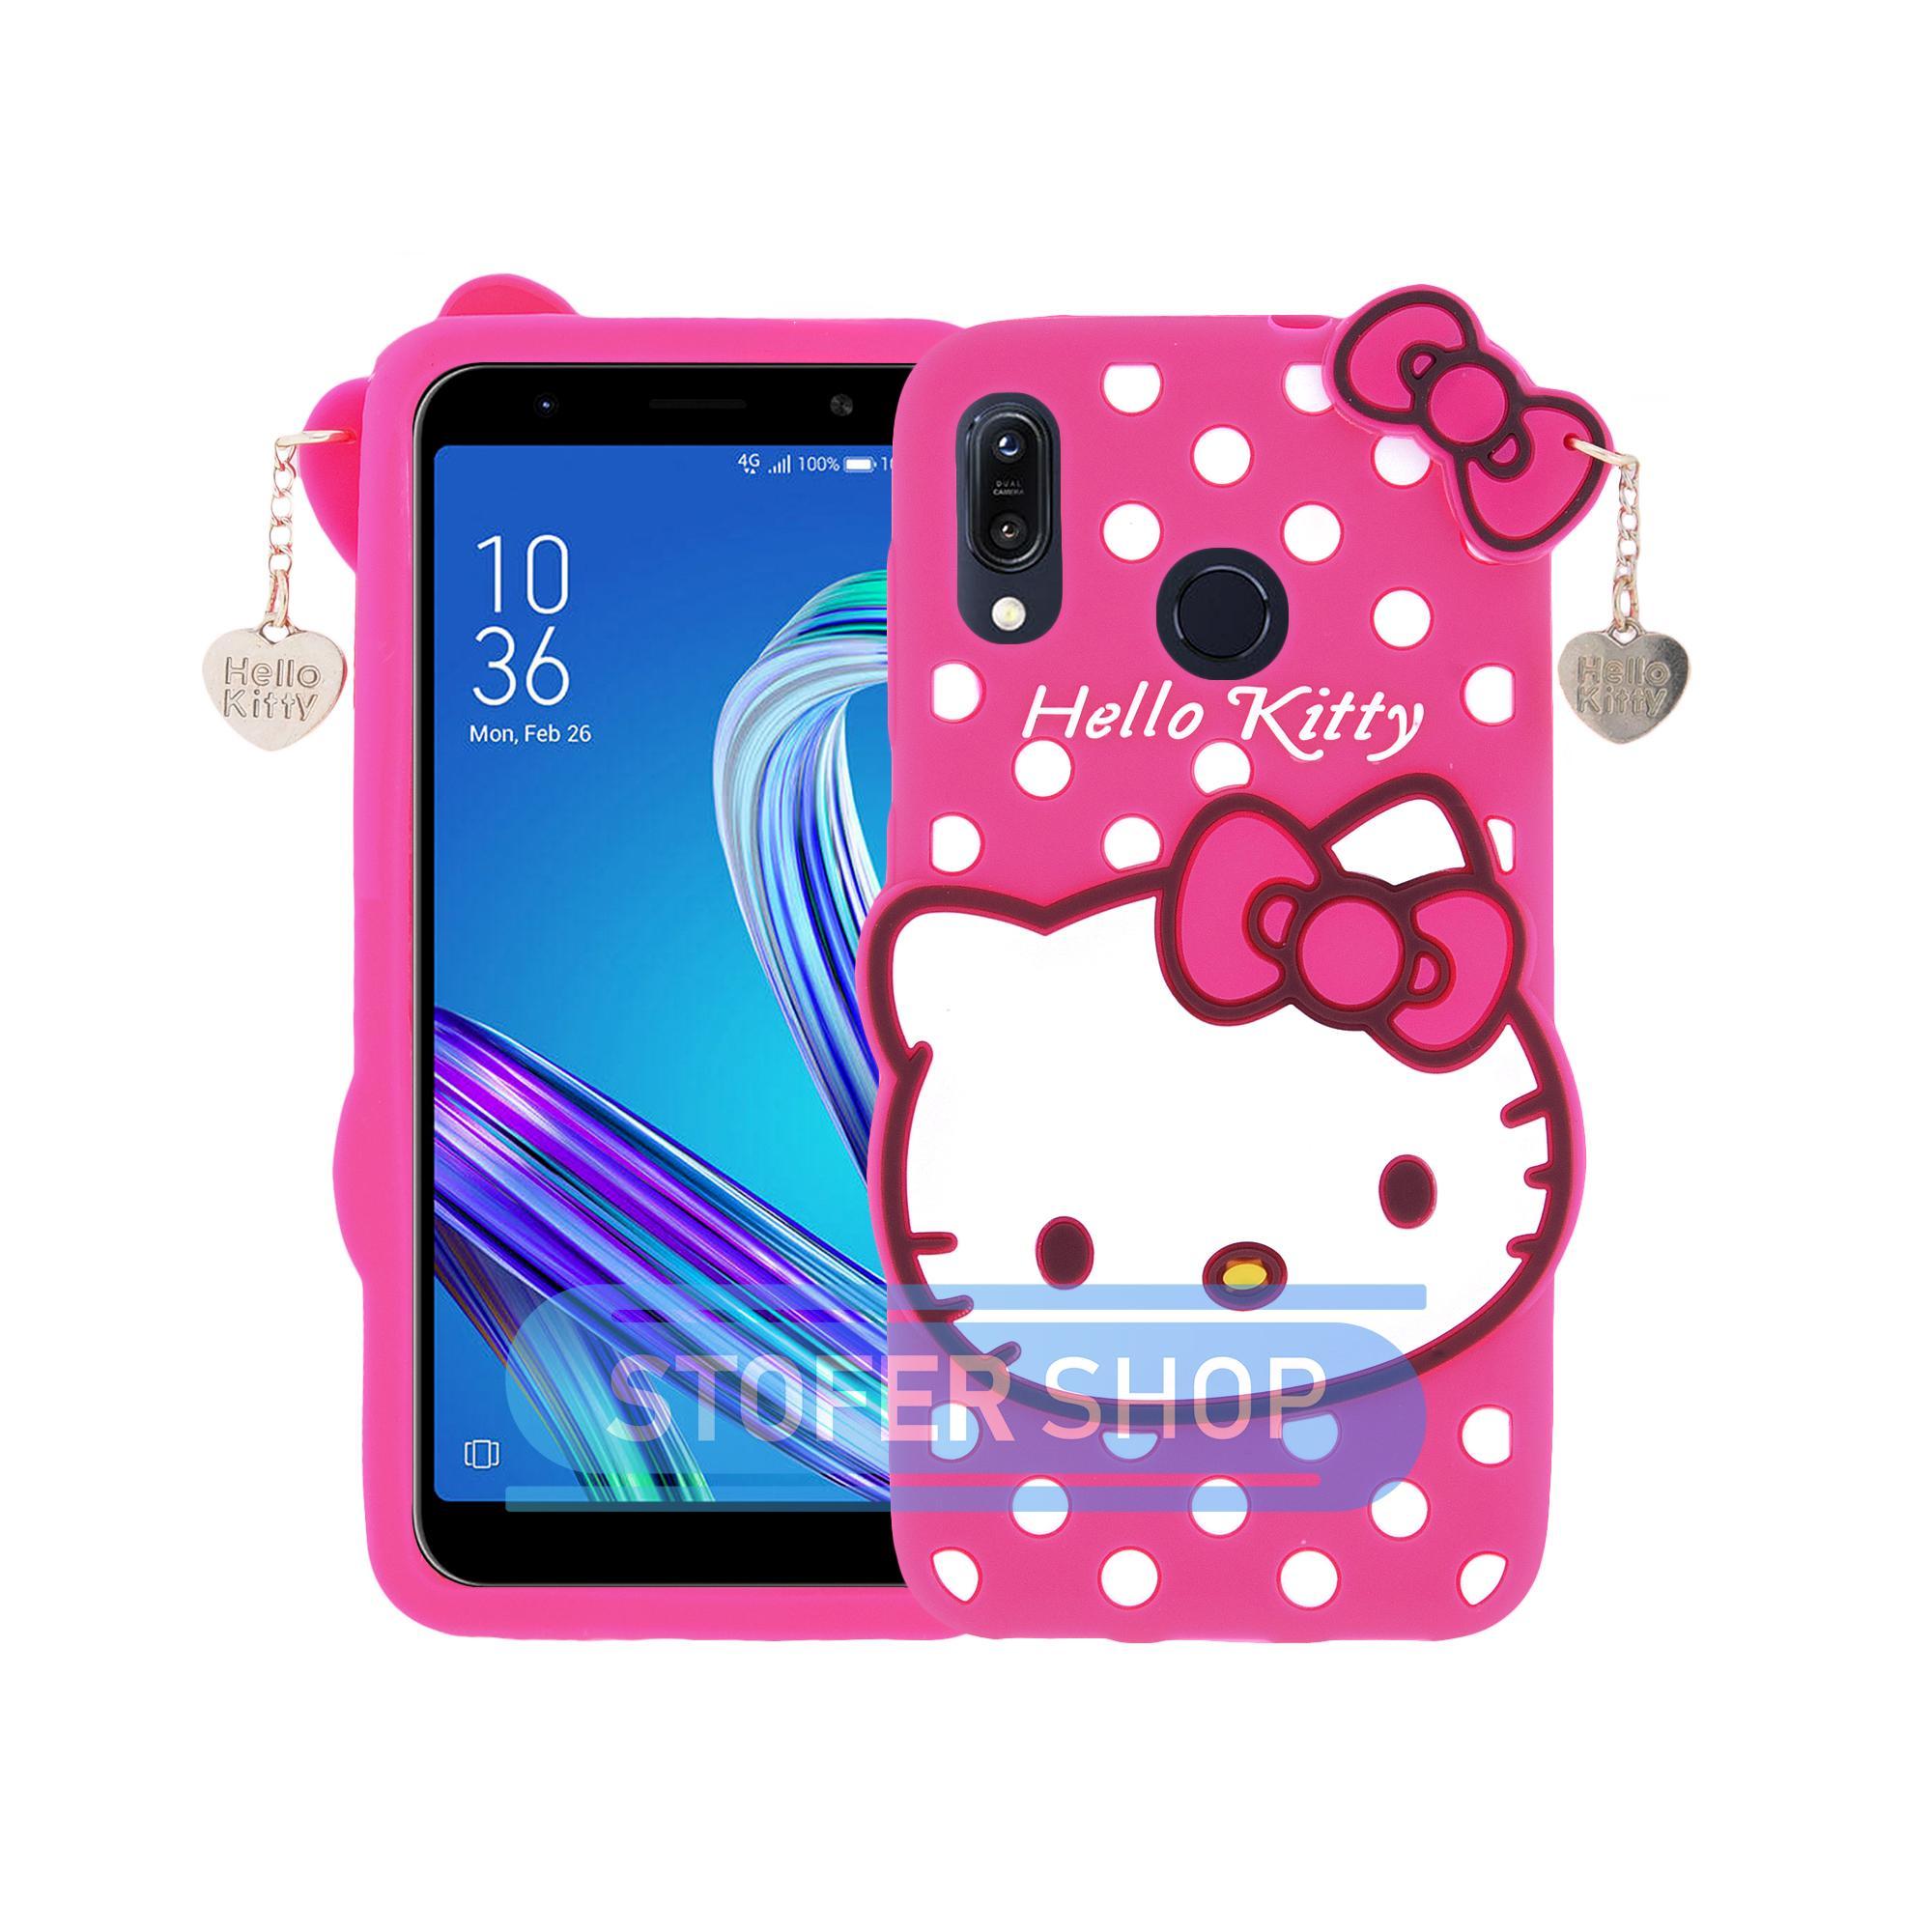 3D Case Hello Kitty Asus Zenfone Max (M1) ZB555KL Softcase 4D Karakter Boneka Hello